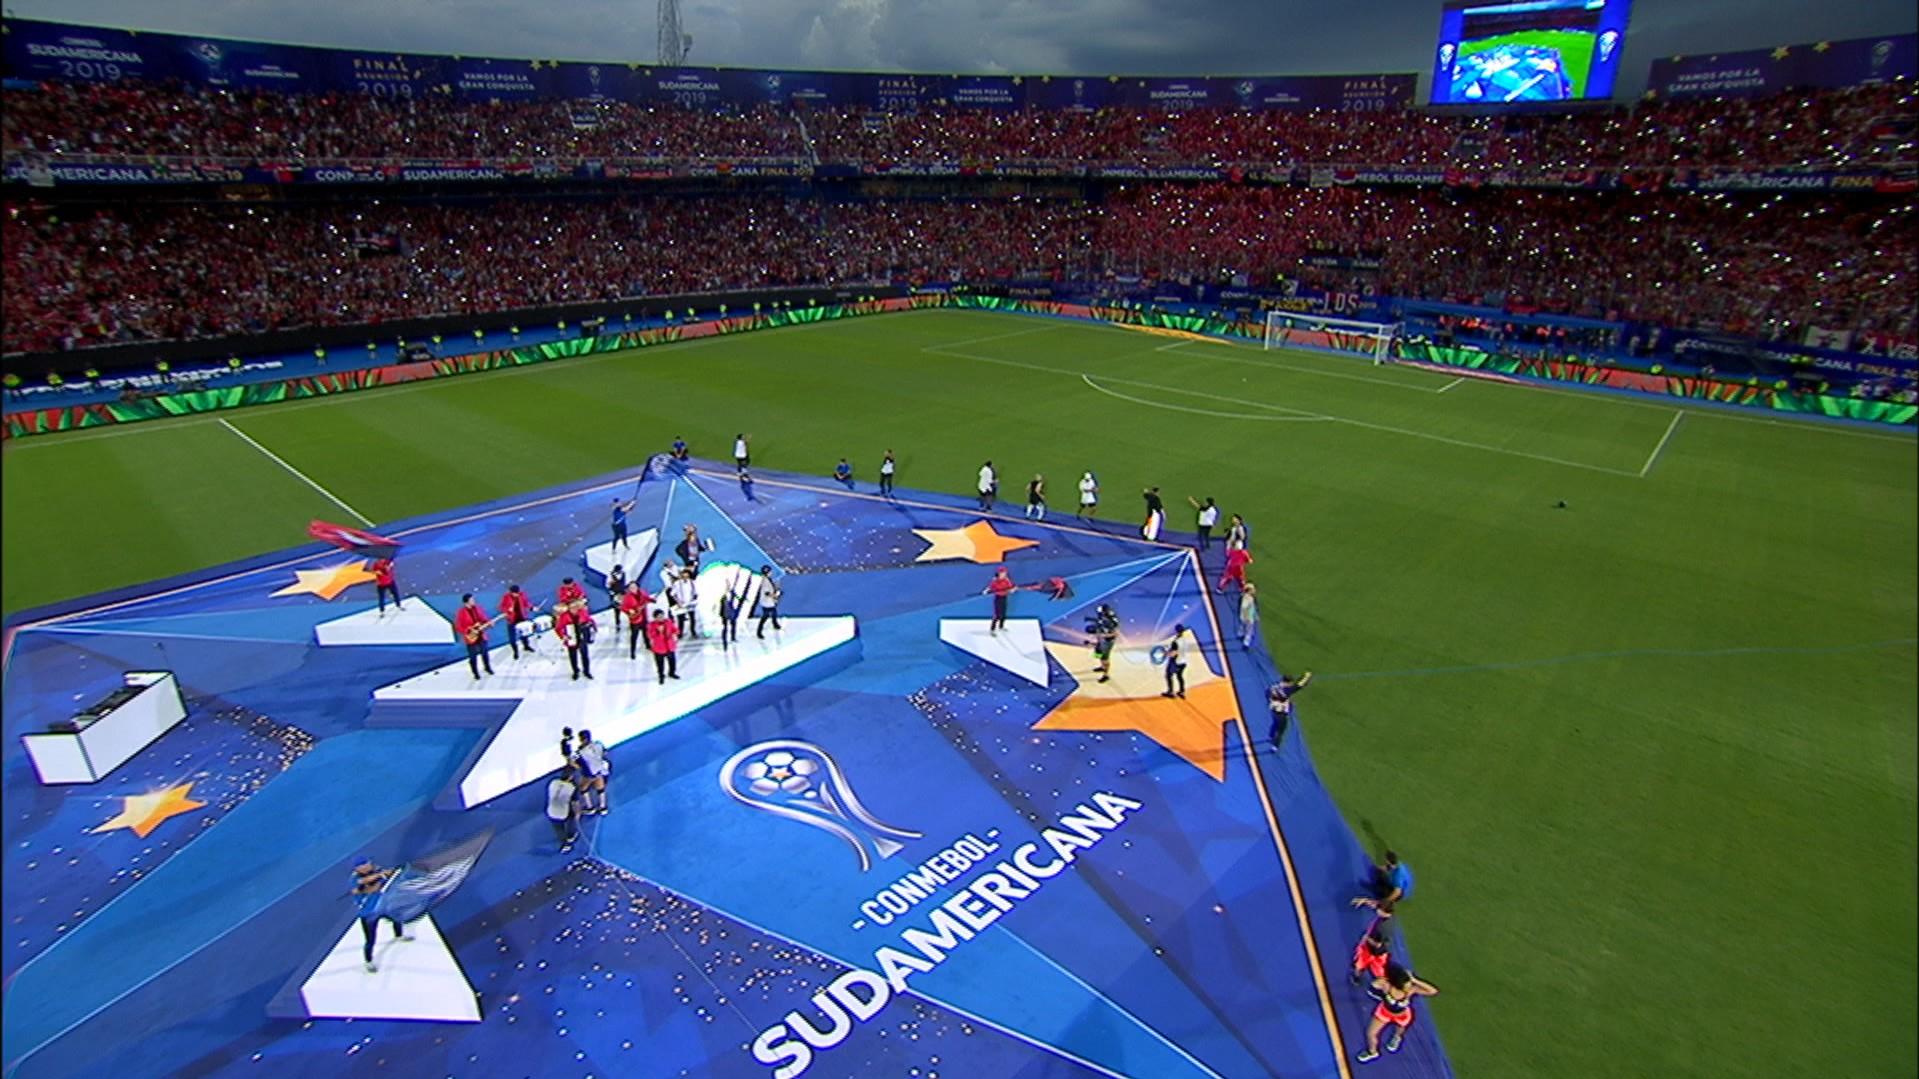 CONMEBOL - SUDAMERICANA